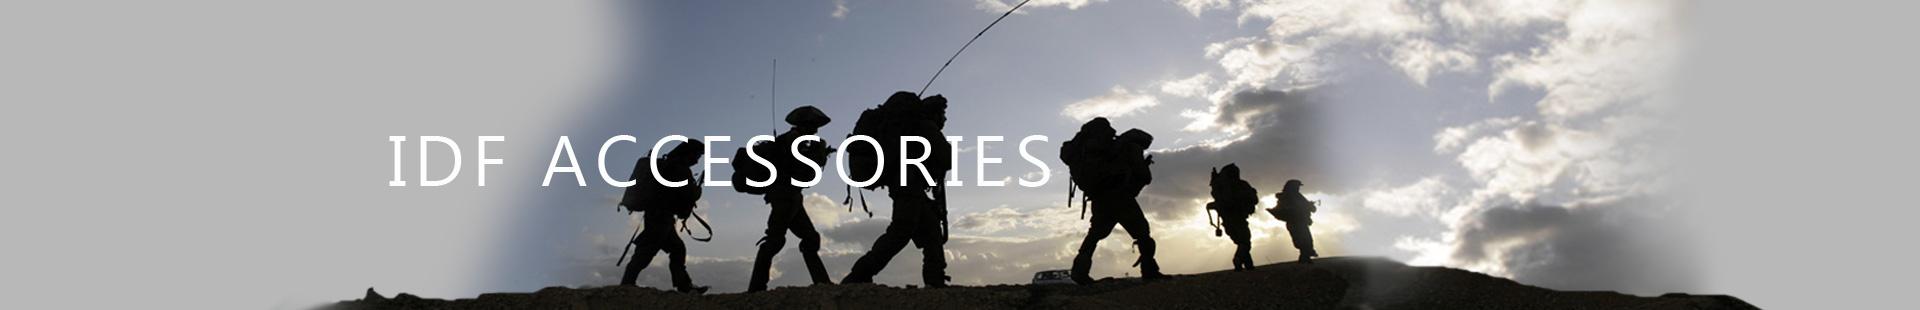 IDF Accessories